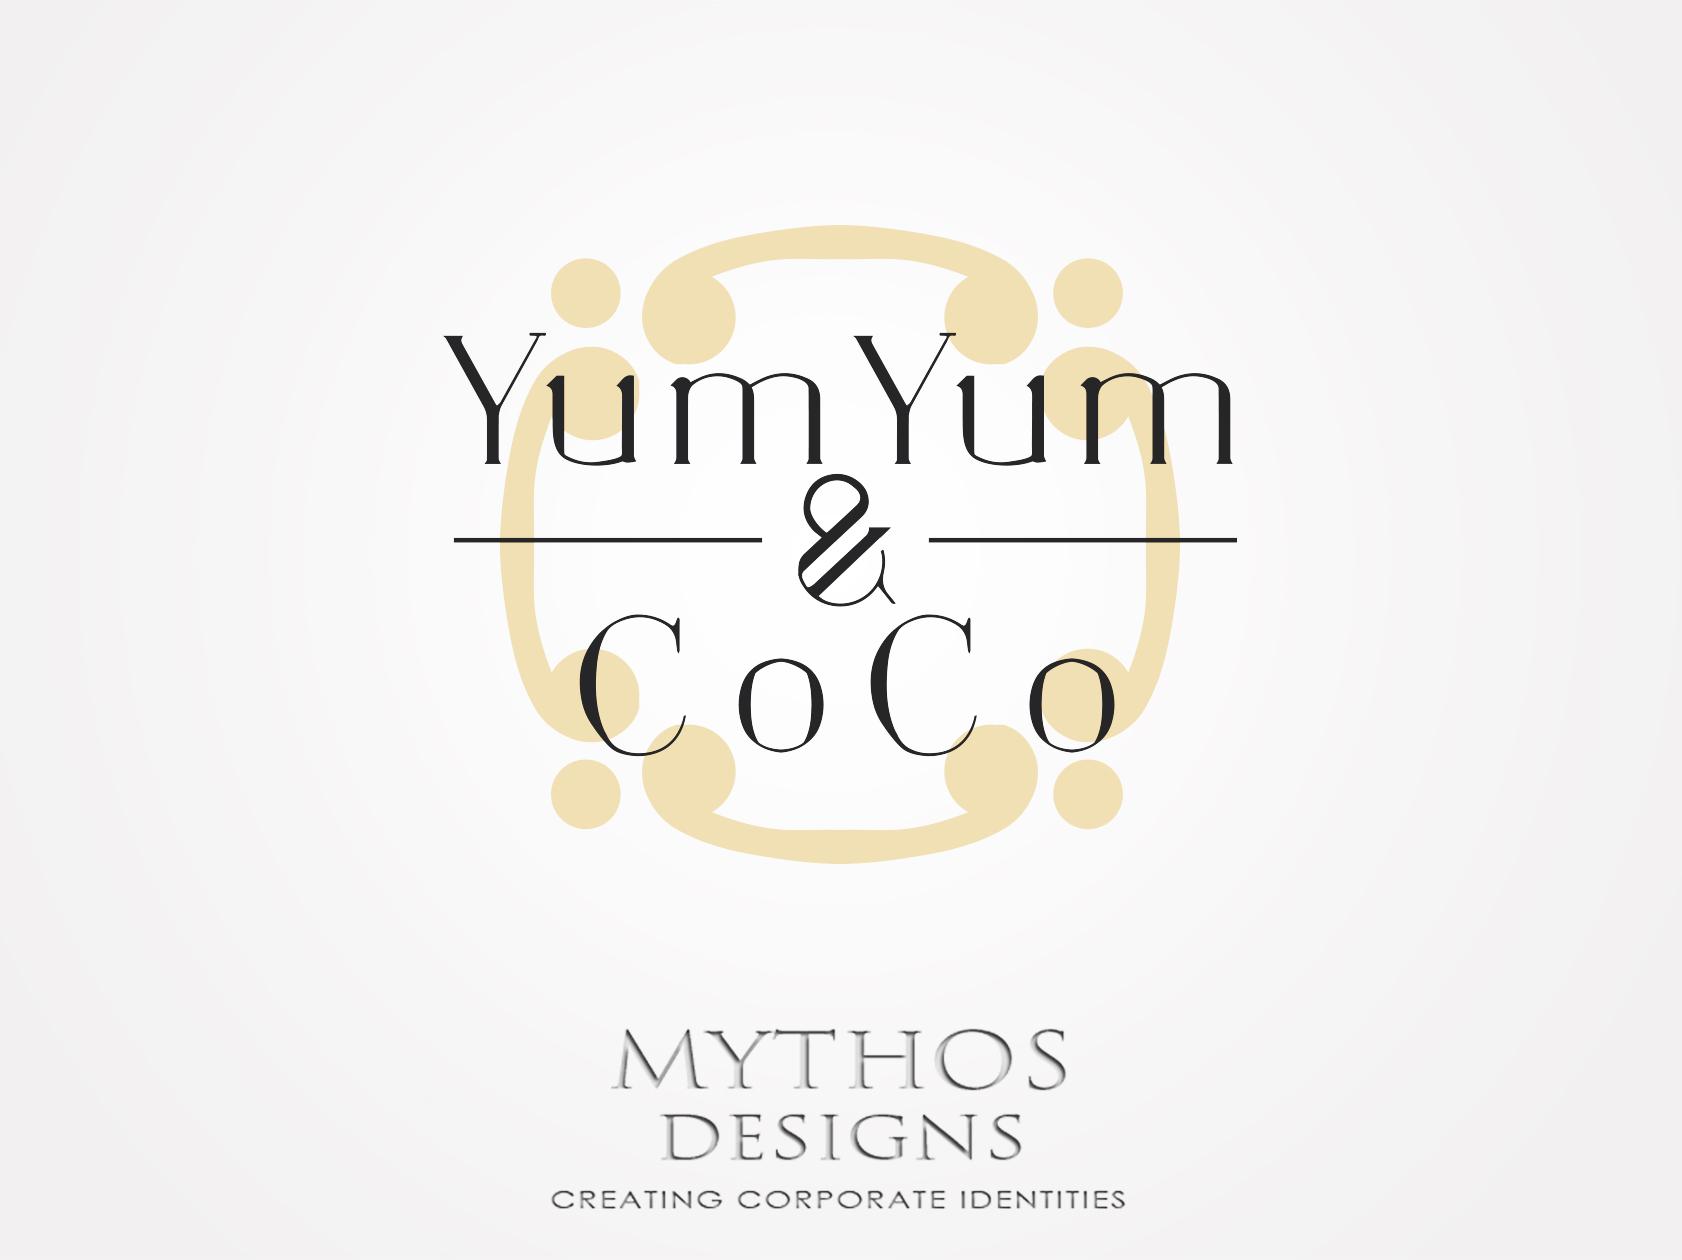 Logo Design by Mythos Designs - Entry No. 11 in the Logo Design Contest Logo Design for YumYum & CoCo.